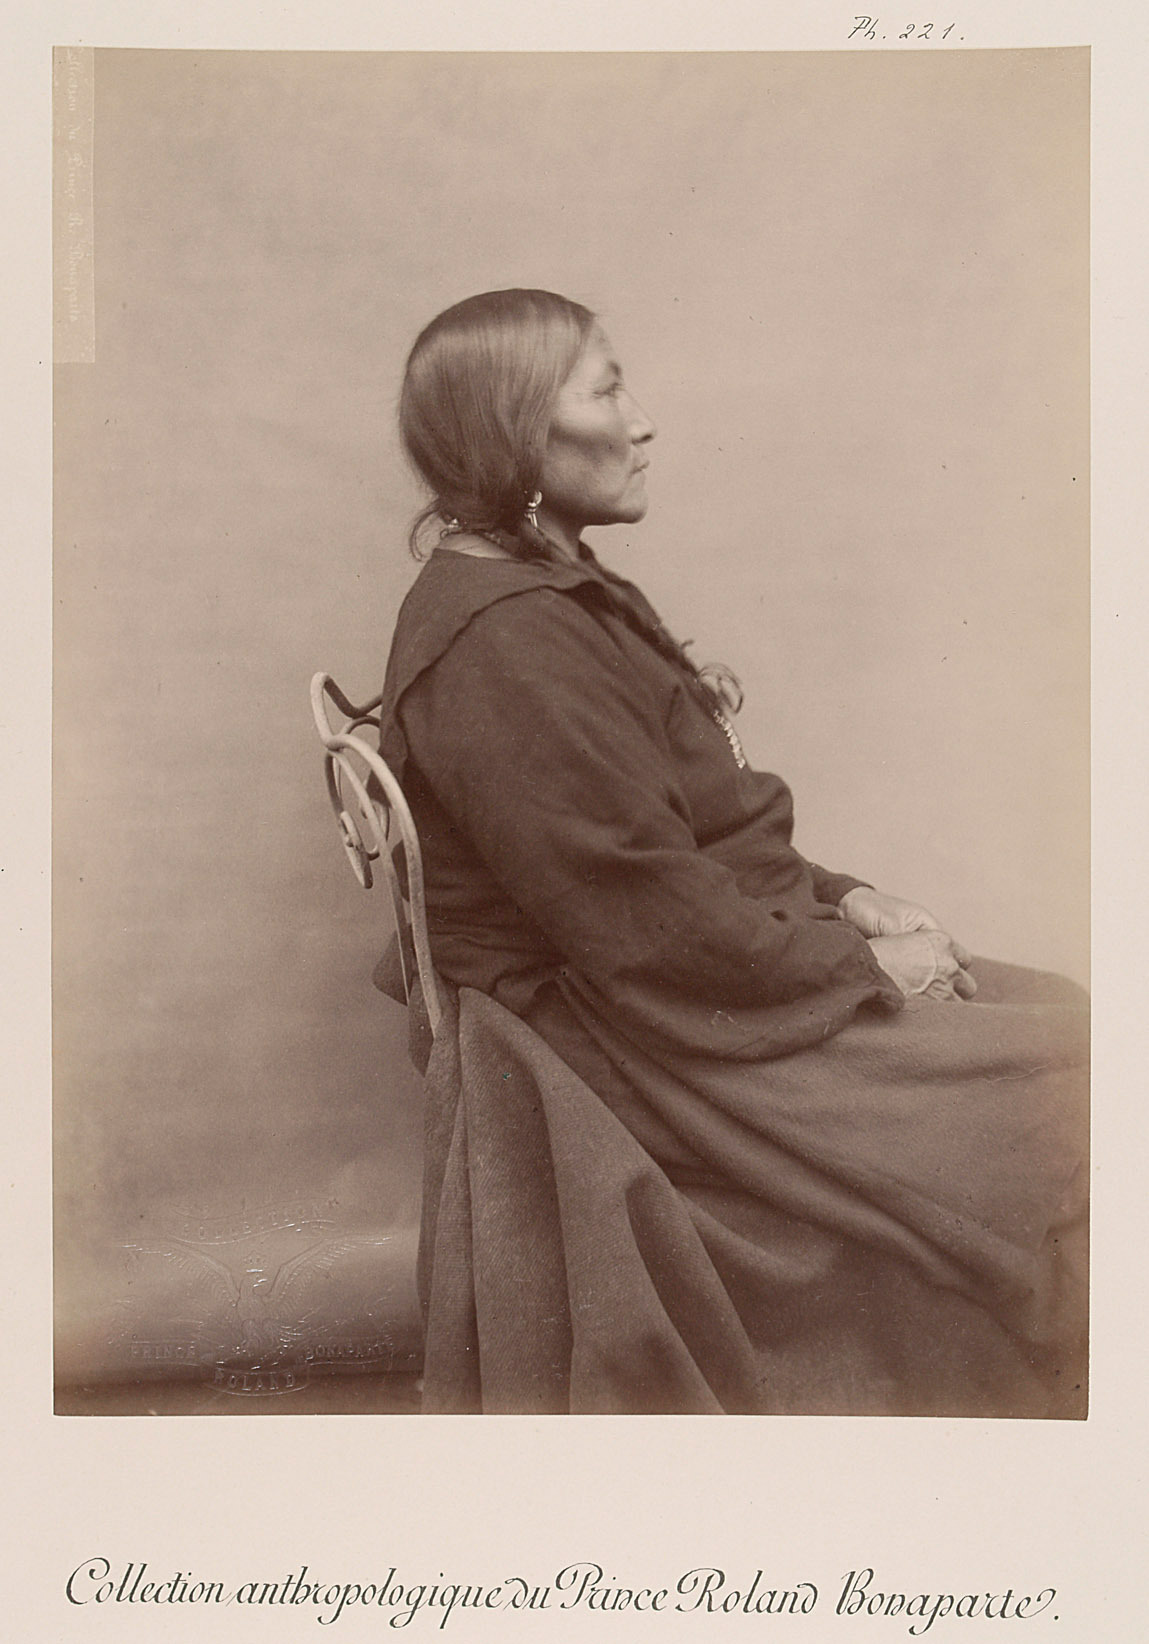 Cook - Nin-daoui, ältere Frau mit Kind, Profilansicht von Prinz Roland Napoléon Bonaparte